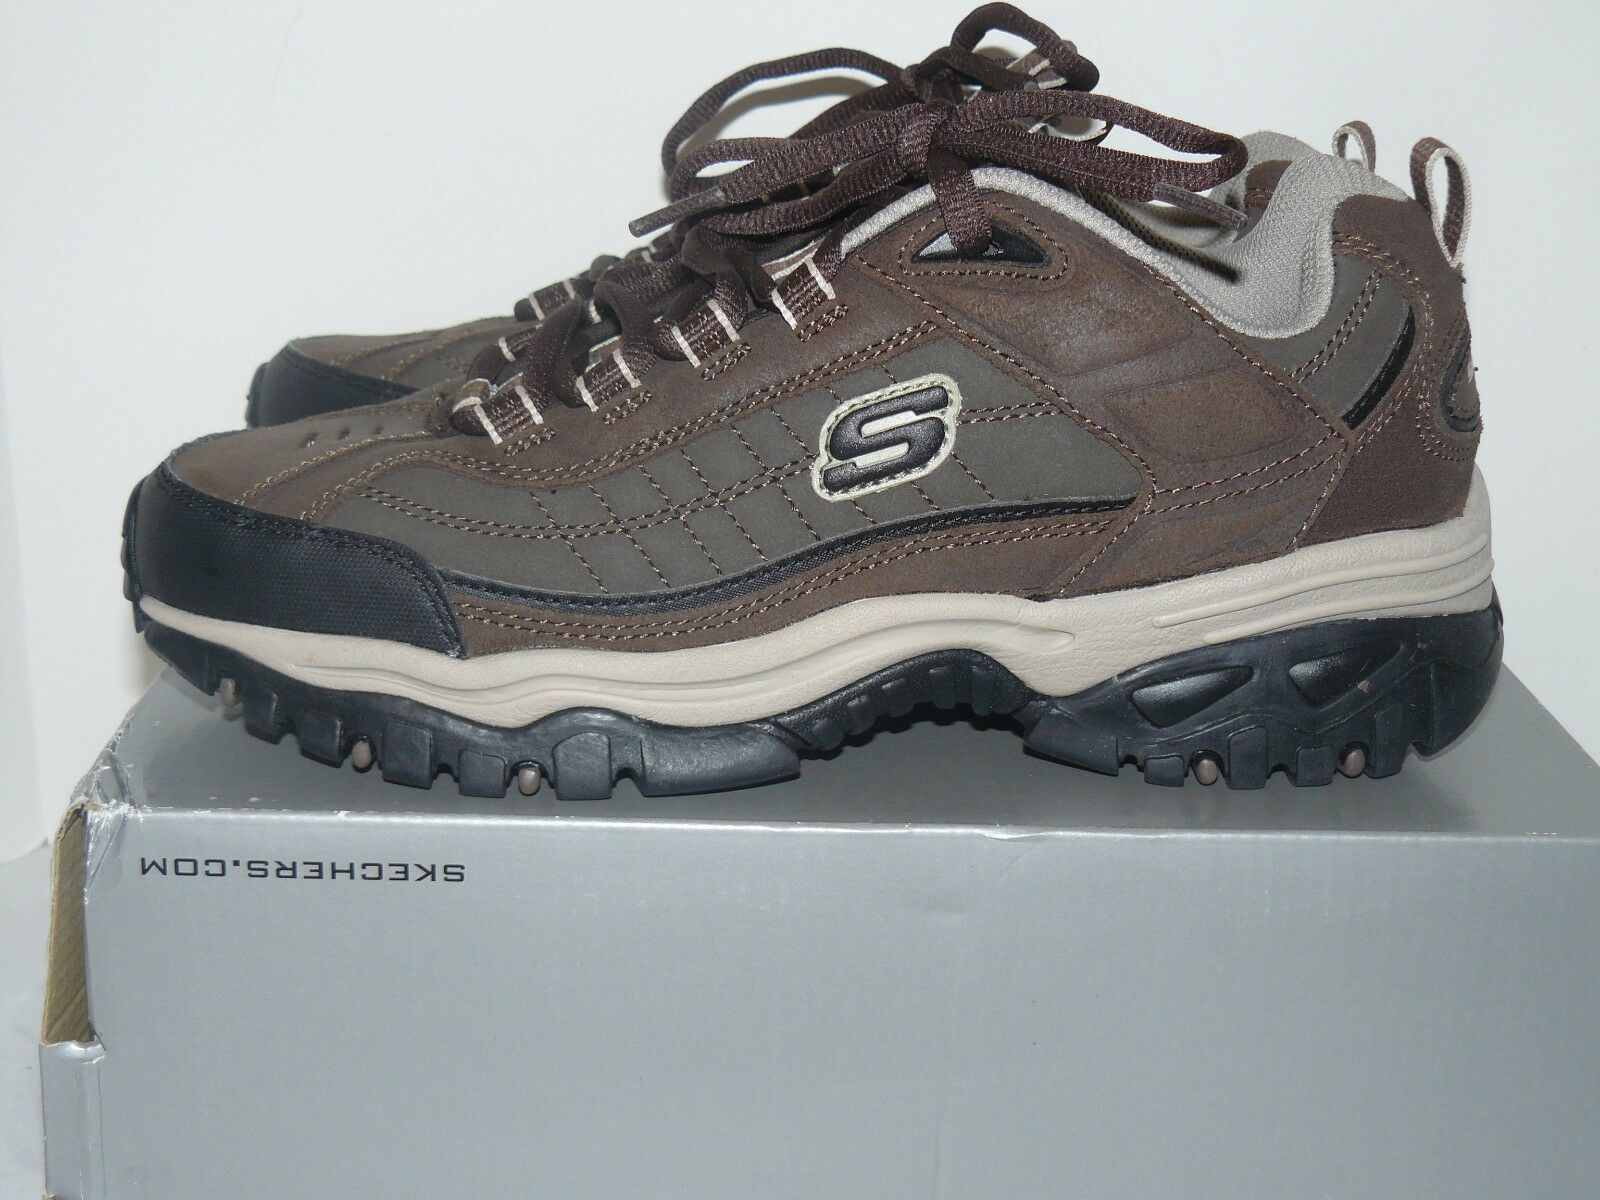 NIB Skechers Mens Downforce Brown/Taupe Comfortable best-selling model of the brand